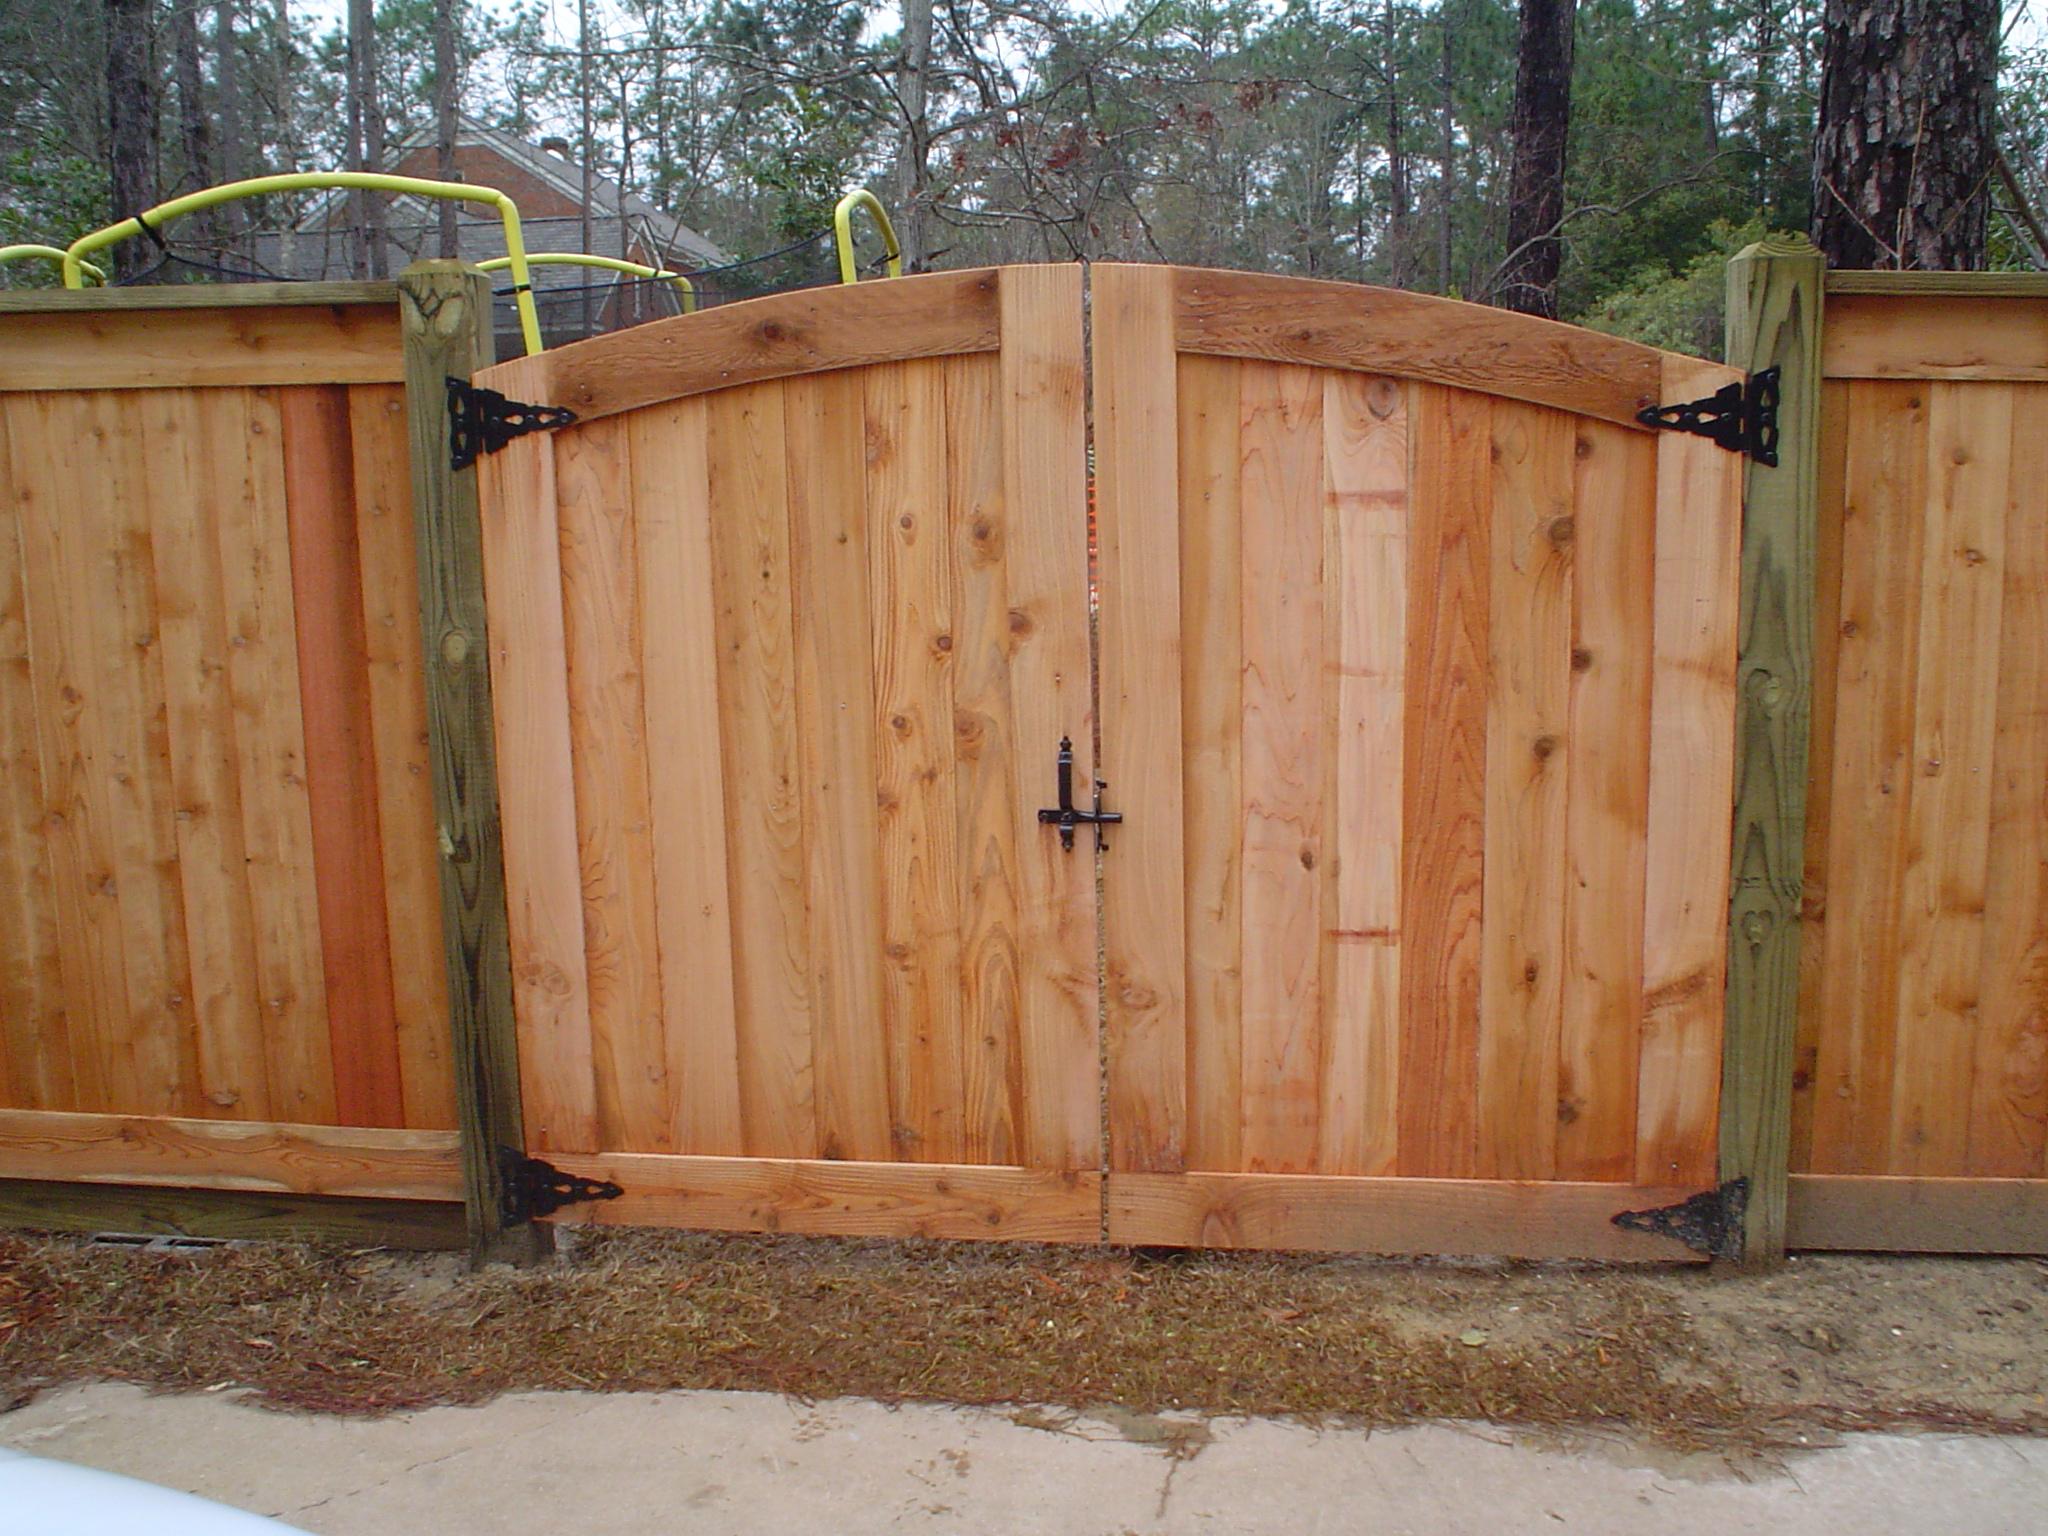 Wood jefcoat fence company of hattiesburg